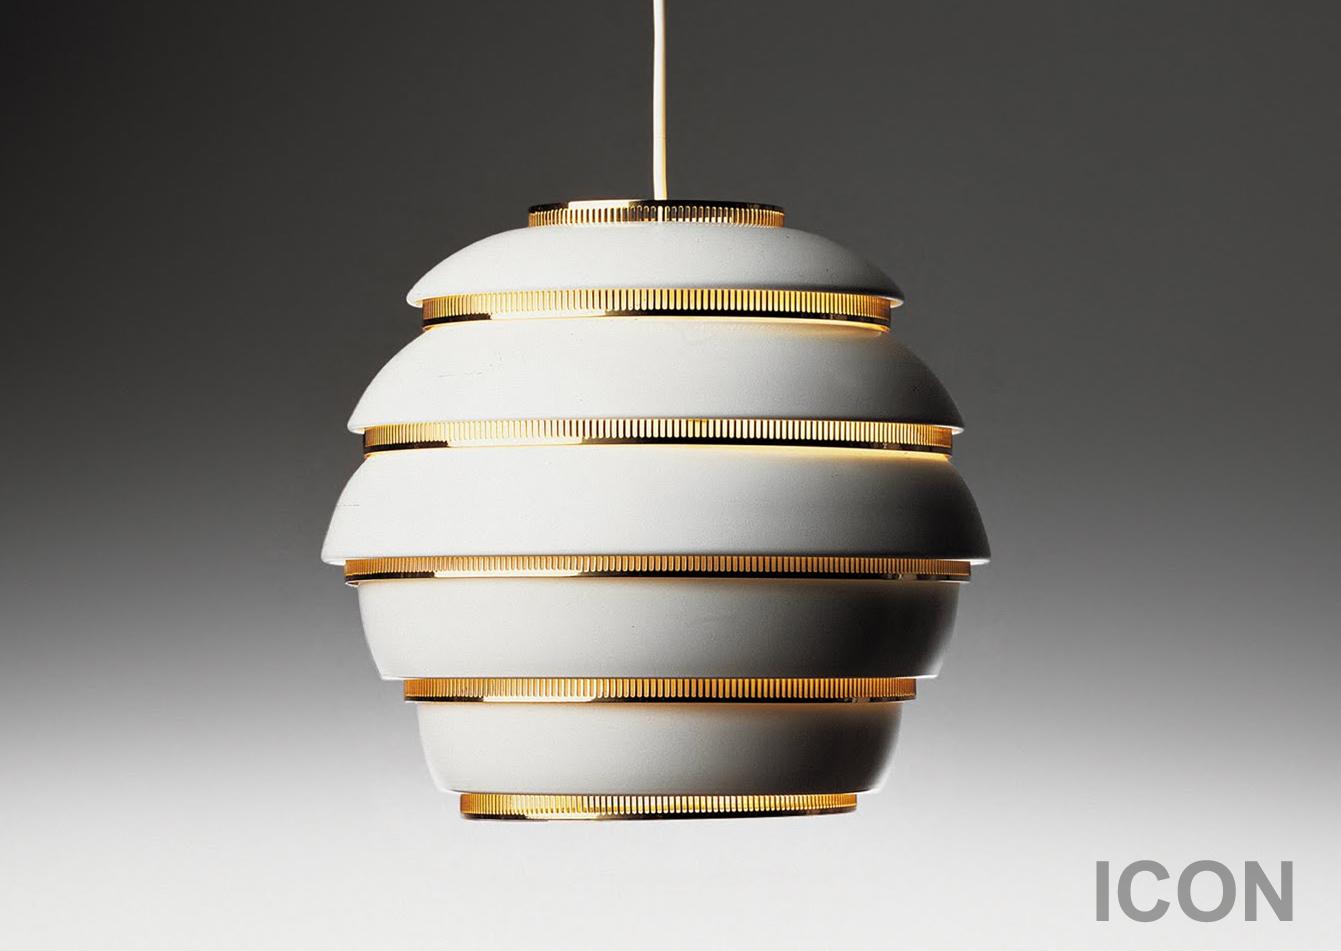 beehive a331 by artek beehive pendant light artek lamp by alvar aalto. Black Bedroom Furniture Sets. Home Design Ideas